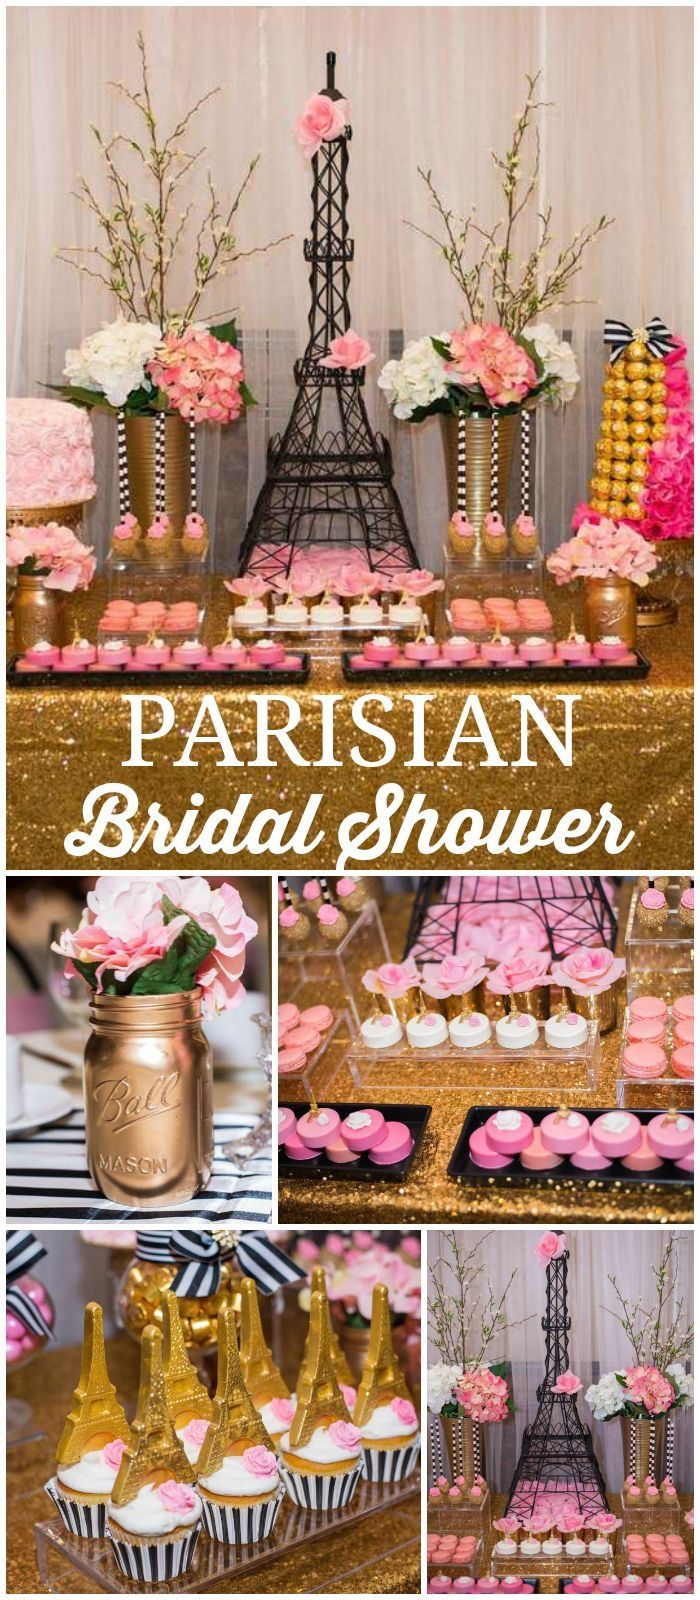 Sa wedding decor images   best photo place images on Pinterest  Events Parisian birthday